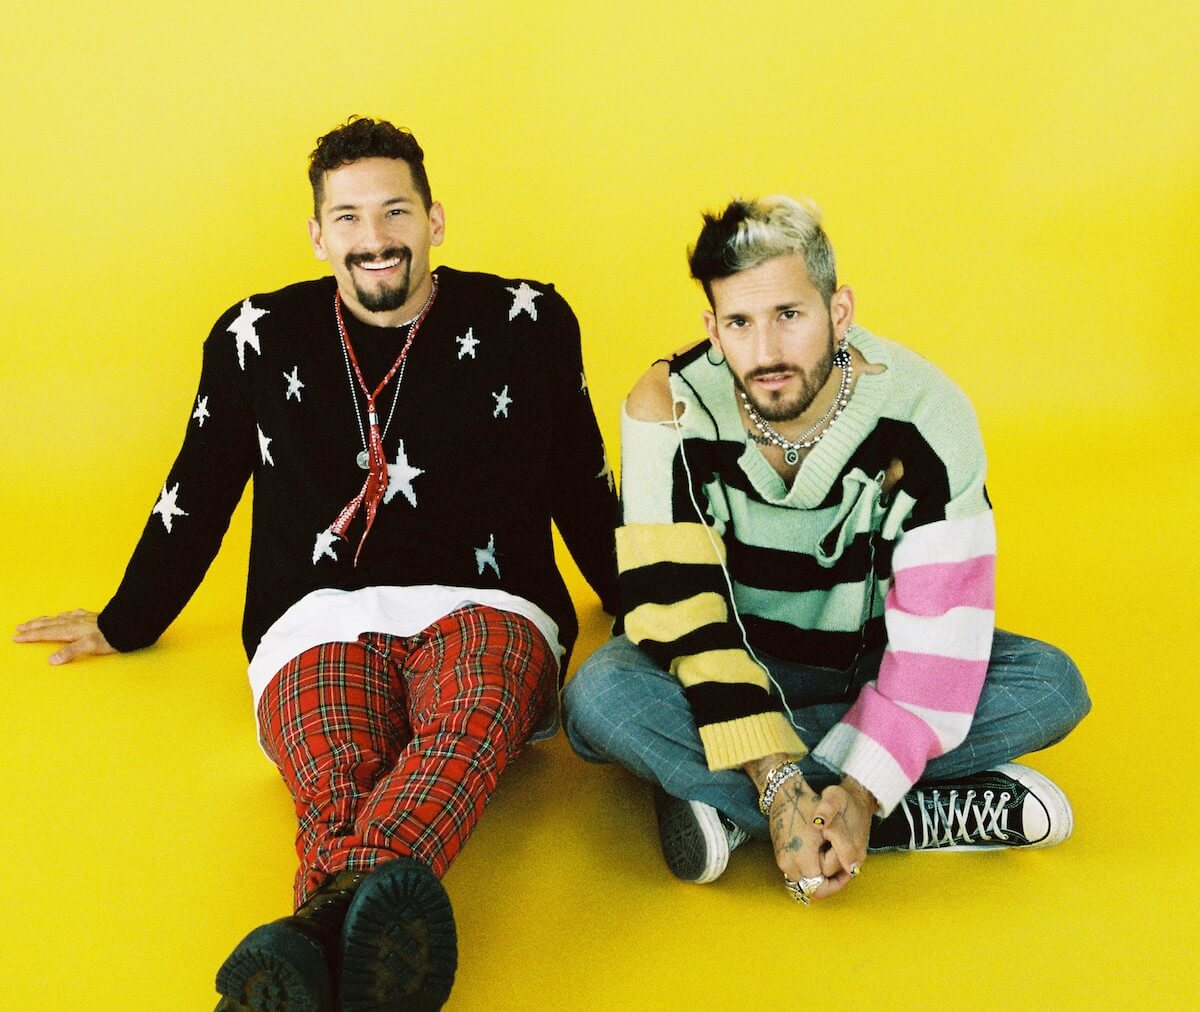 Mau y Ricky yellow background